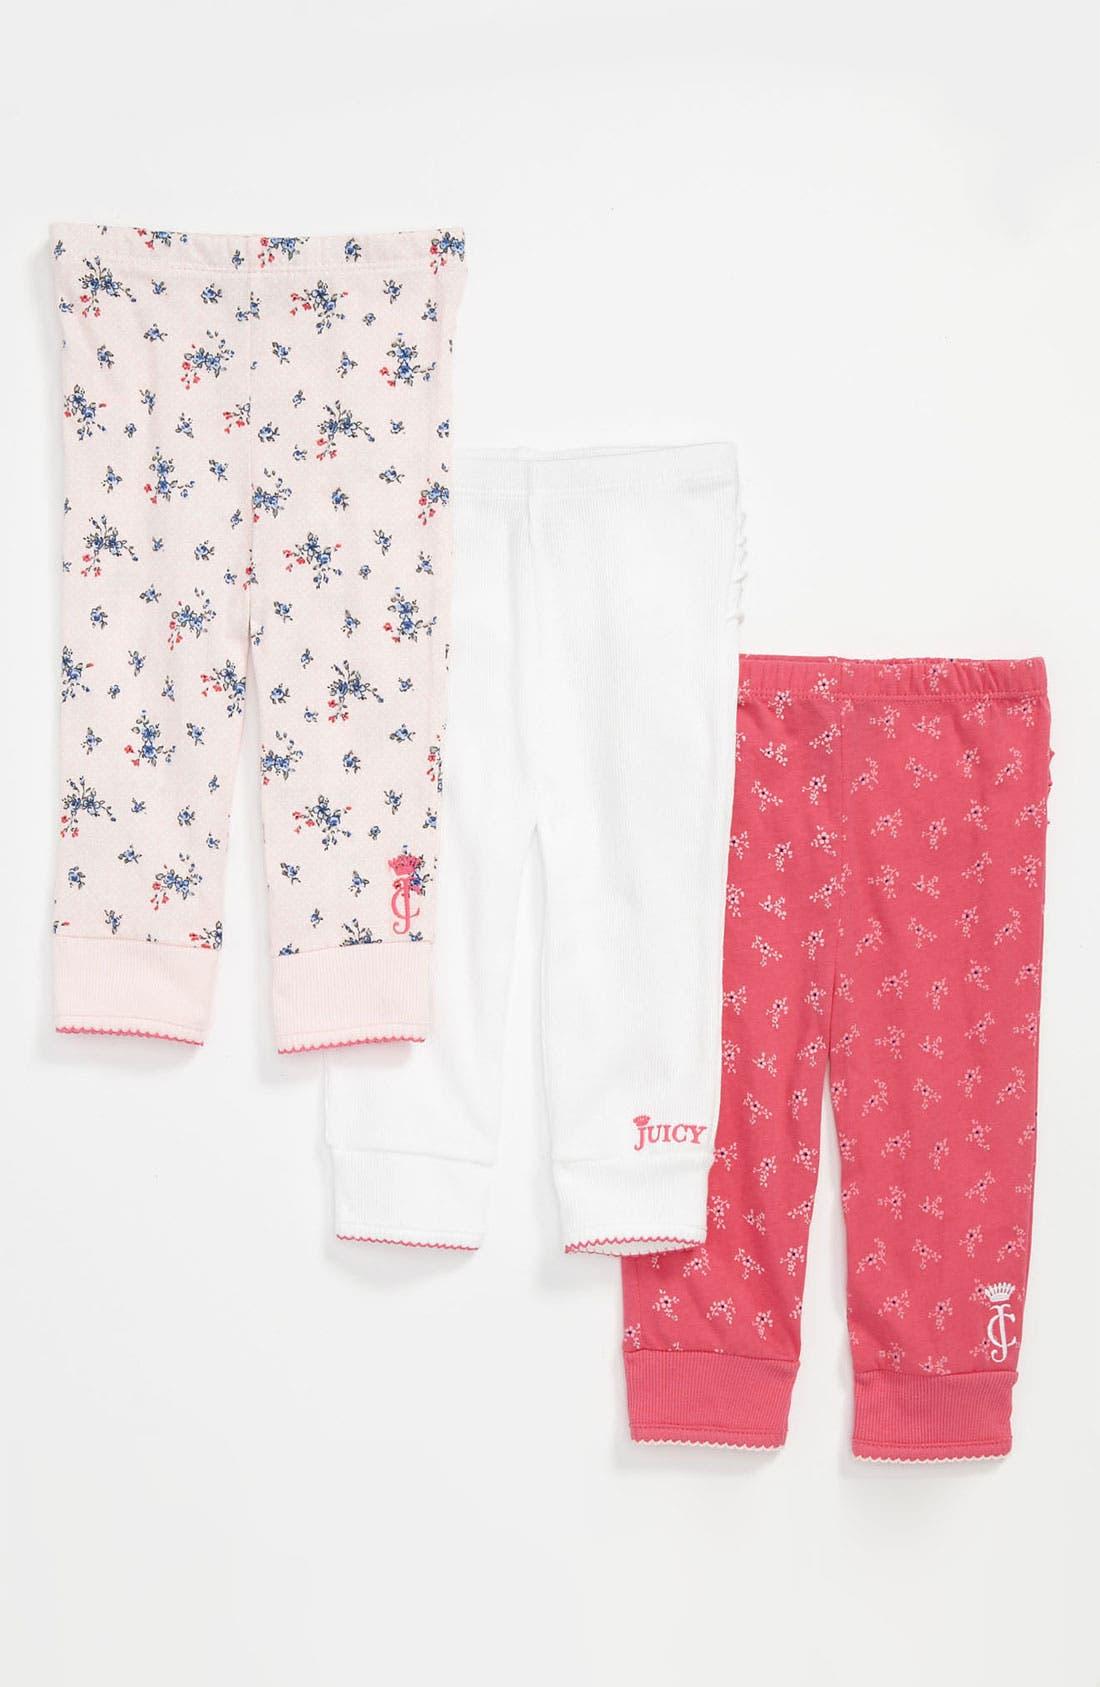 Main Image - Juicy Couture Leggings (3-Pack) (Baby)